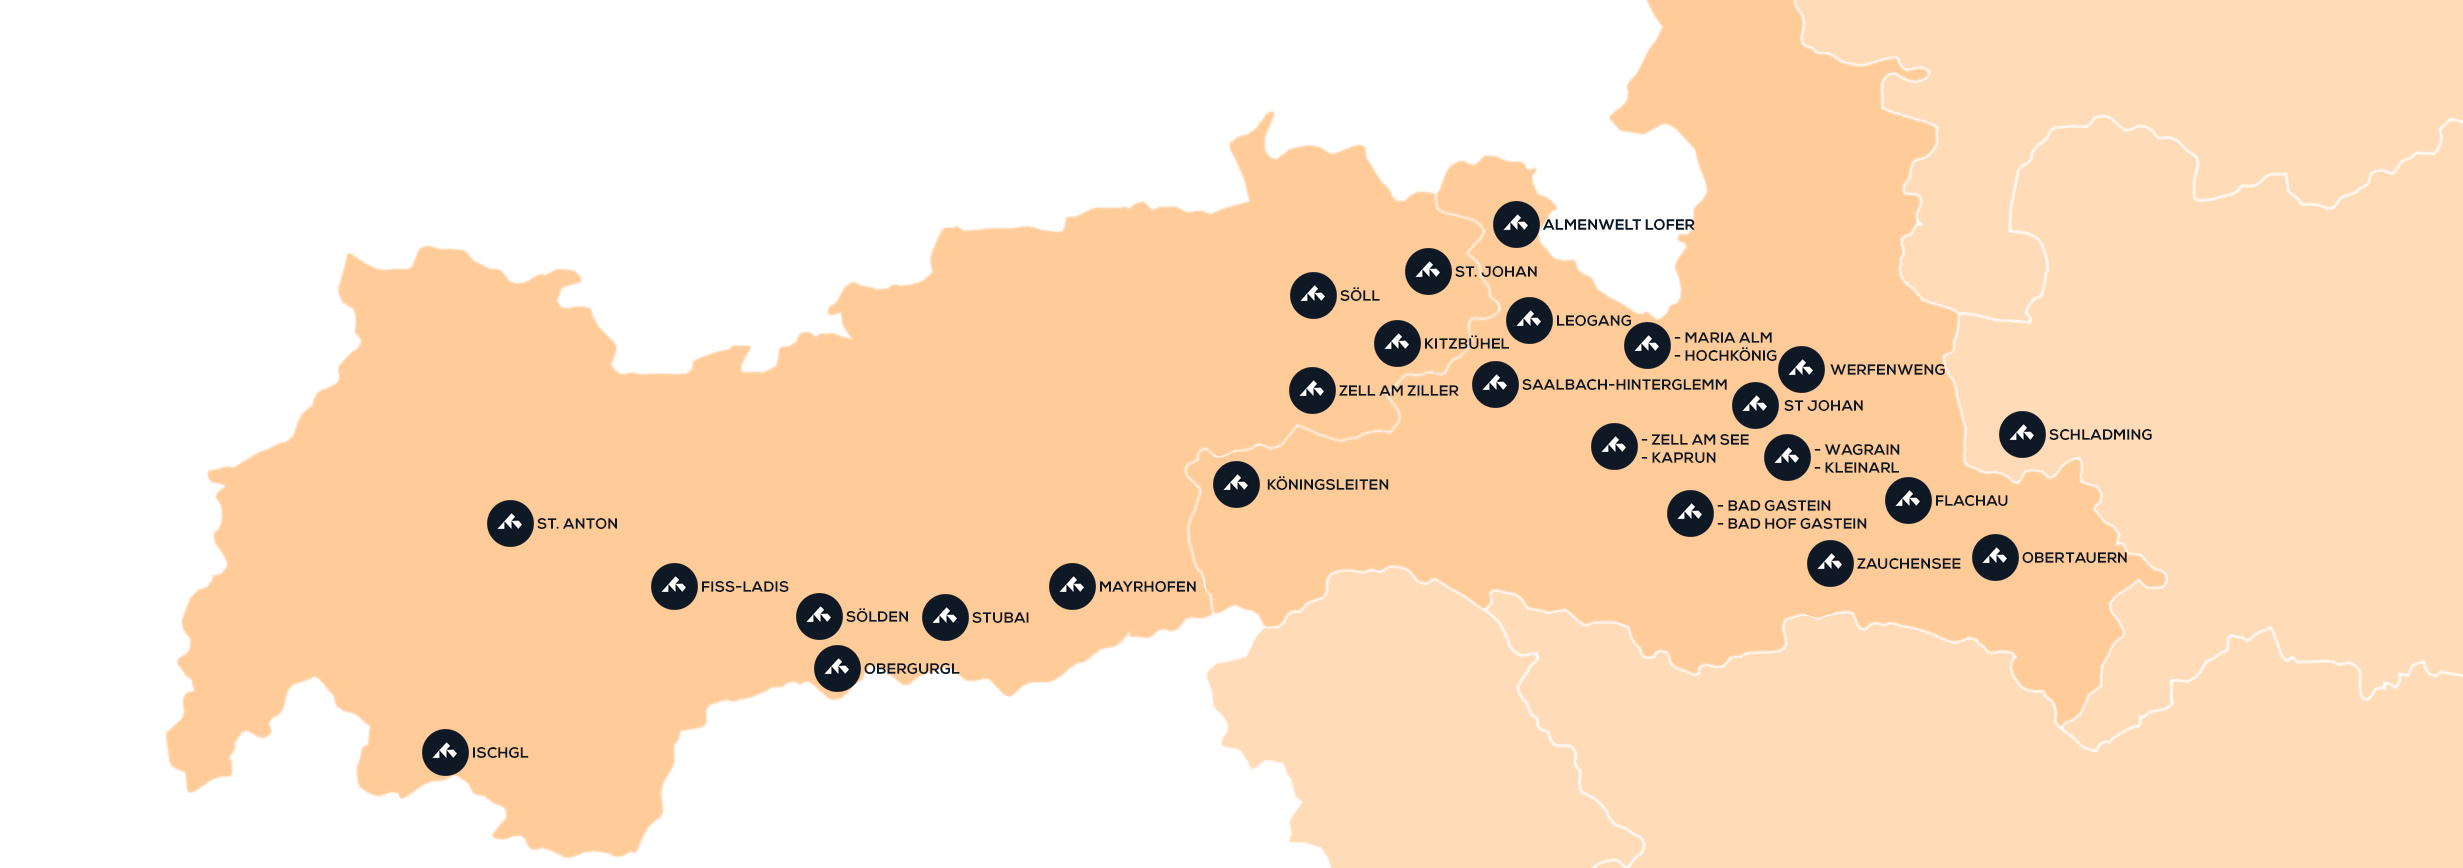 Map of destinations in Austria